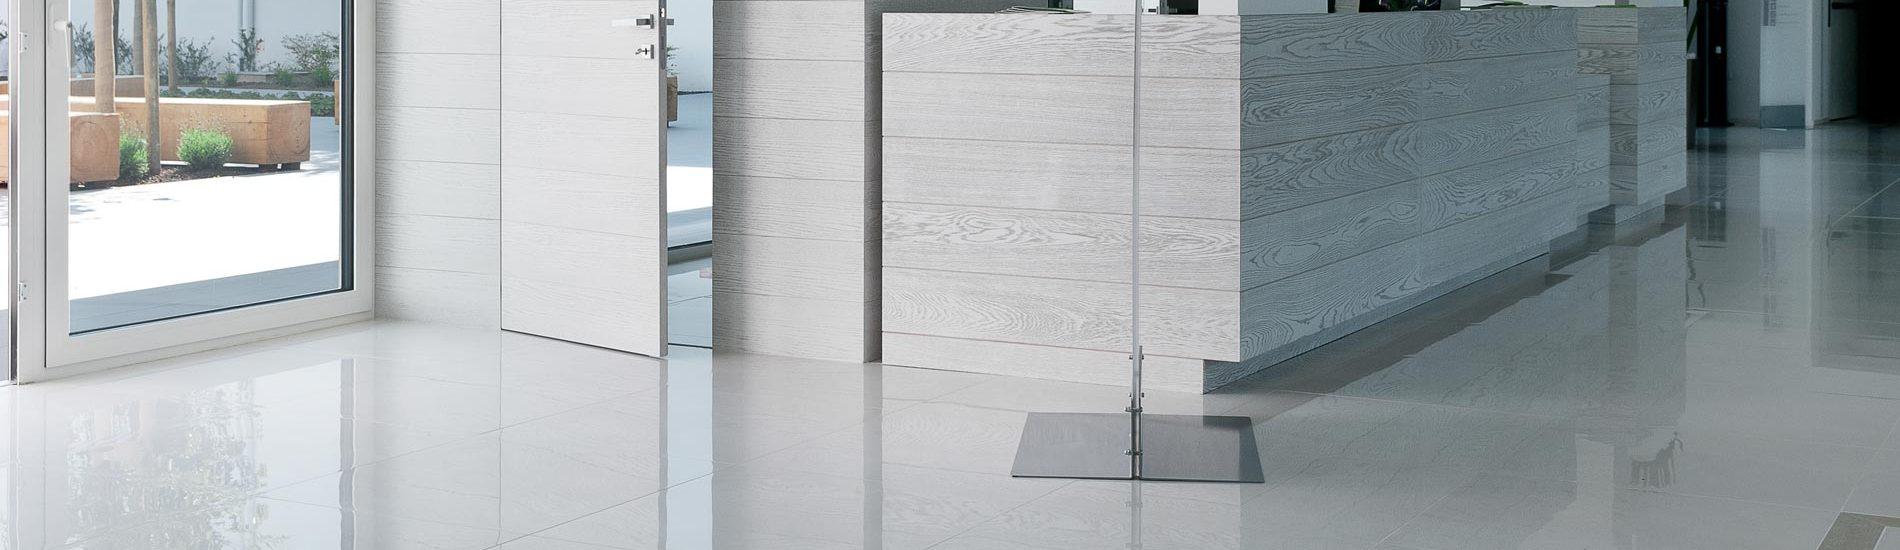 banner-i-bianchi-florim-rex-floor-wall-tile